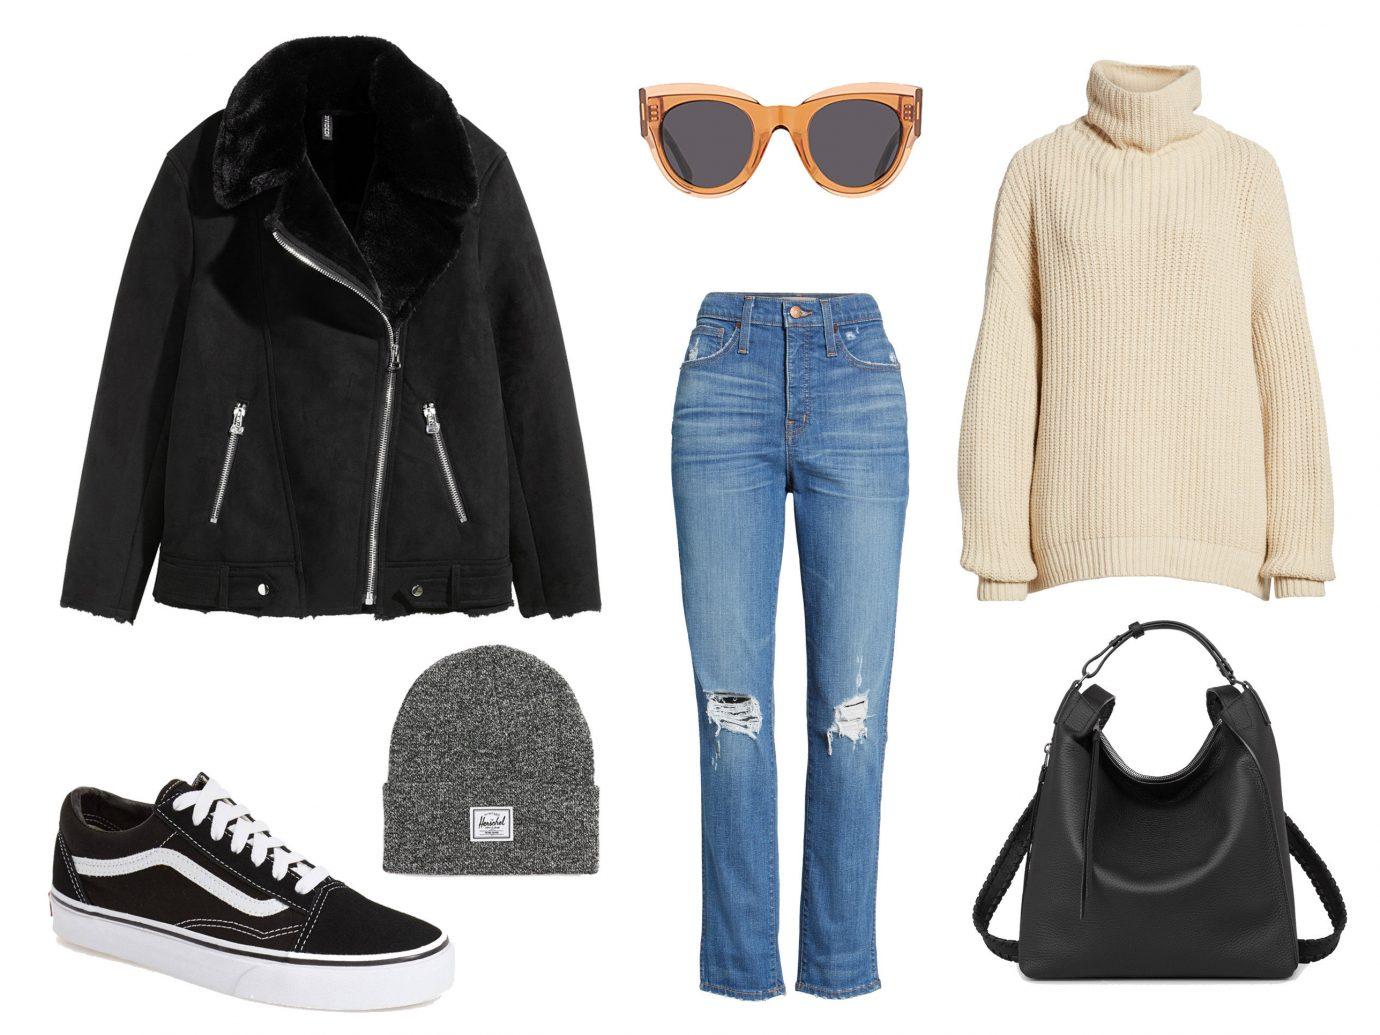 City Trip Ideas Weekend Getaways clothing fashion shoe outerwear jacket product hood coat fur brand fashion design